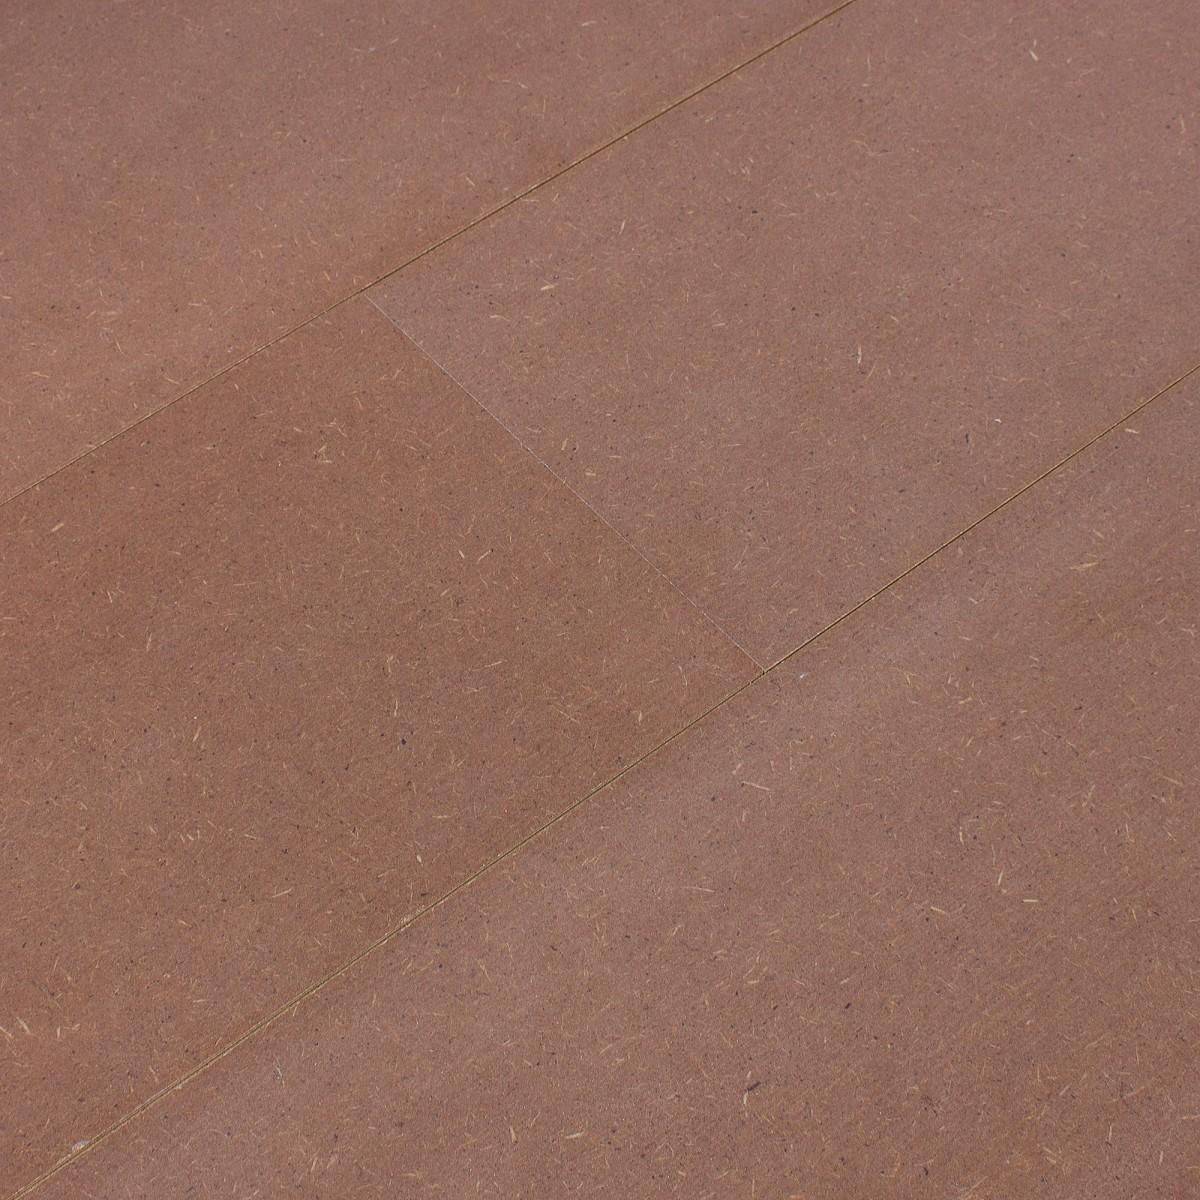 Ламинат Халва карамельная 31 класс толщина 6 мм 2.66 м²